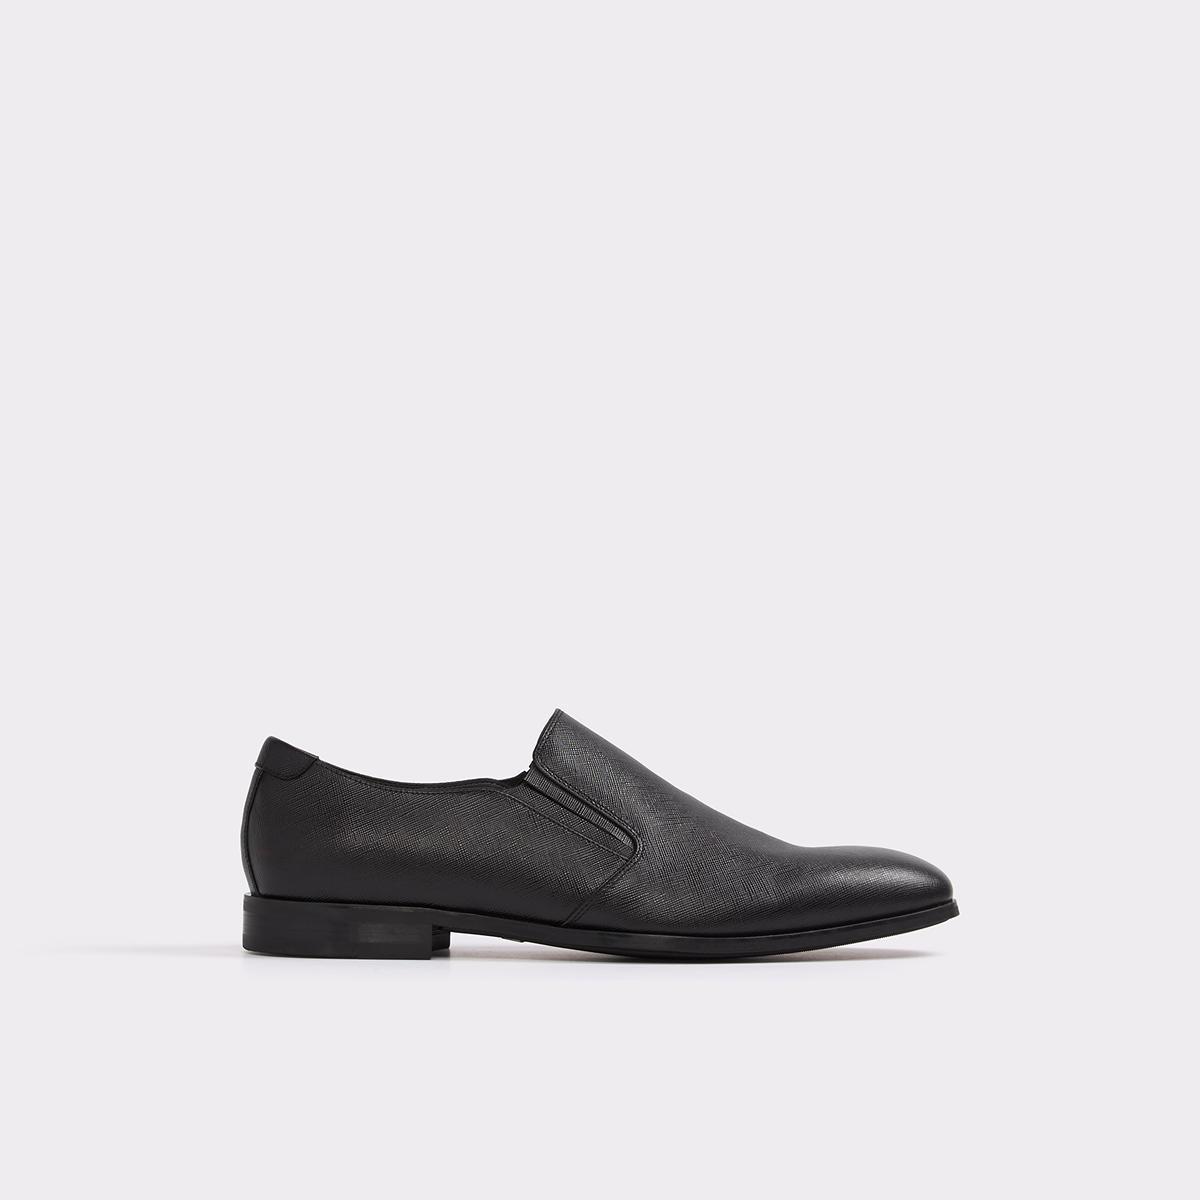 New Aldo Jesper Leather Black Loafers for Men Sale Online